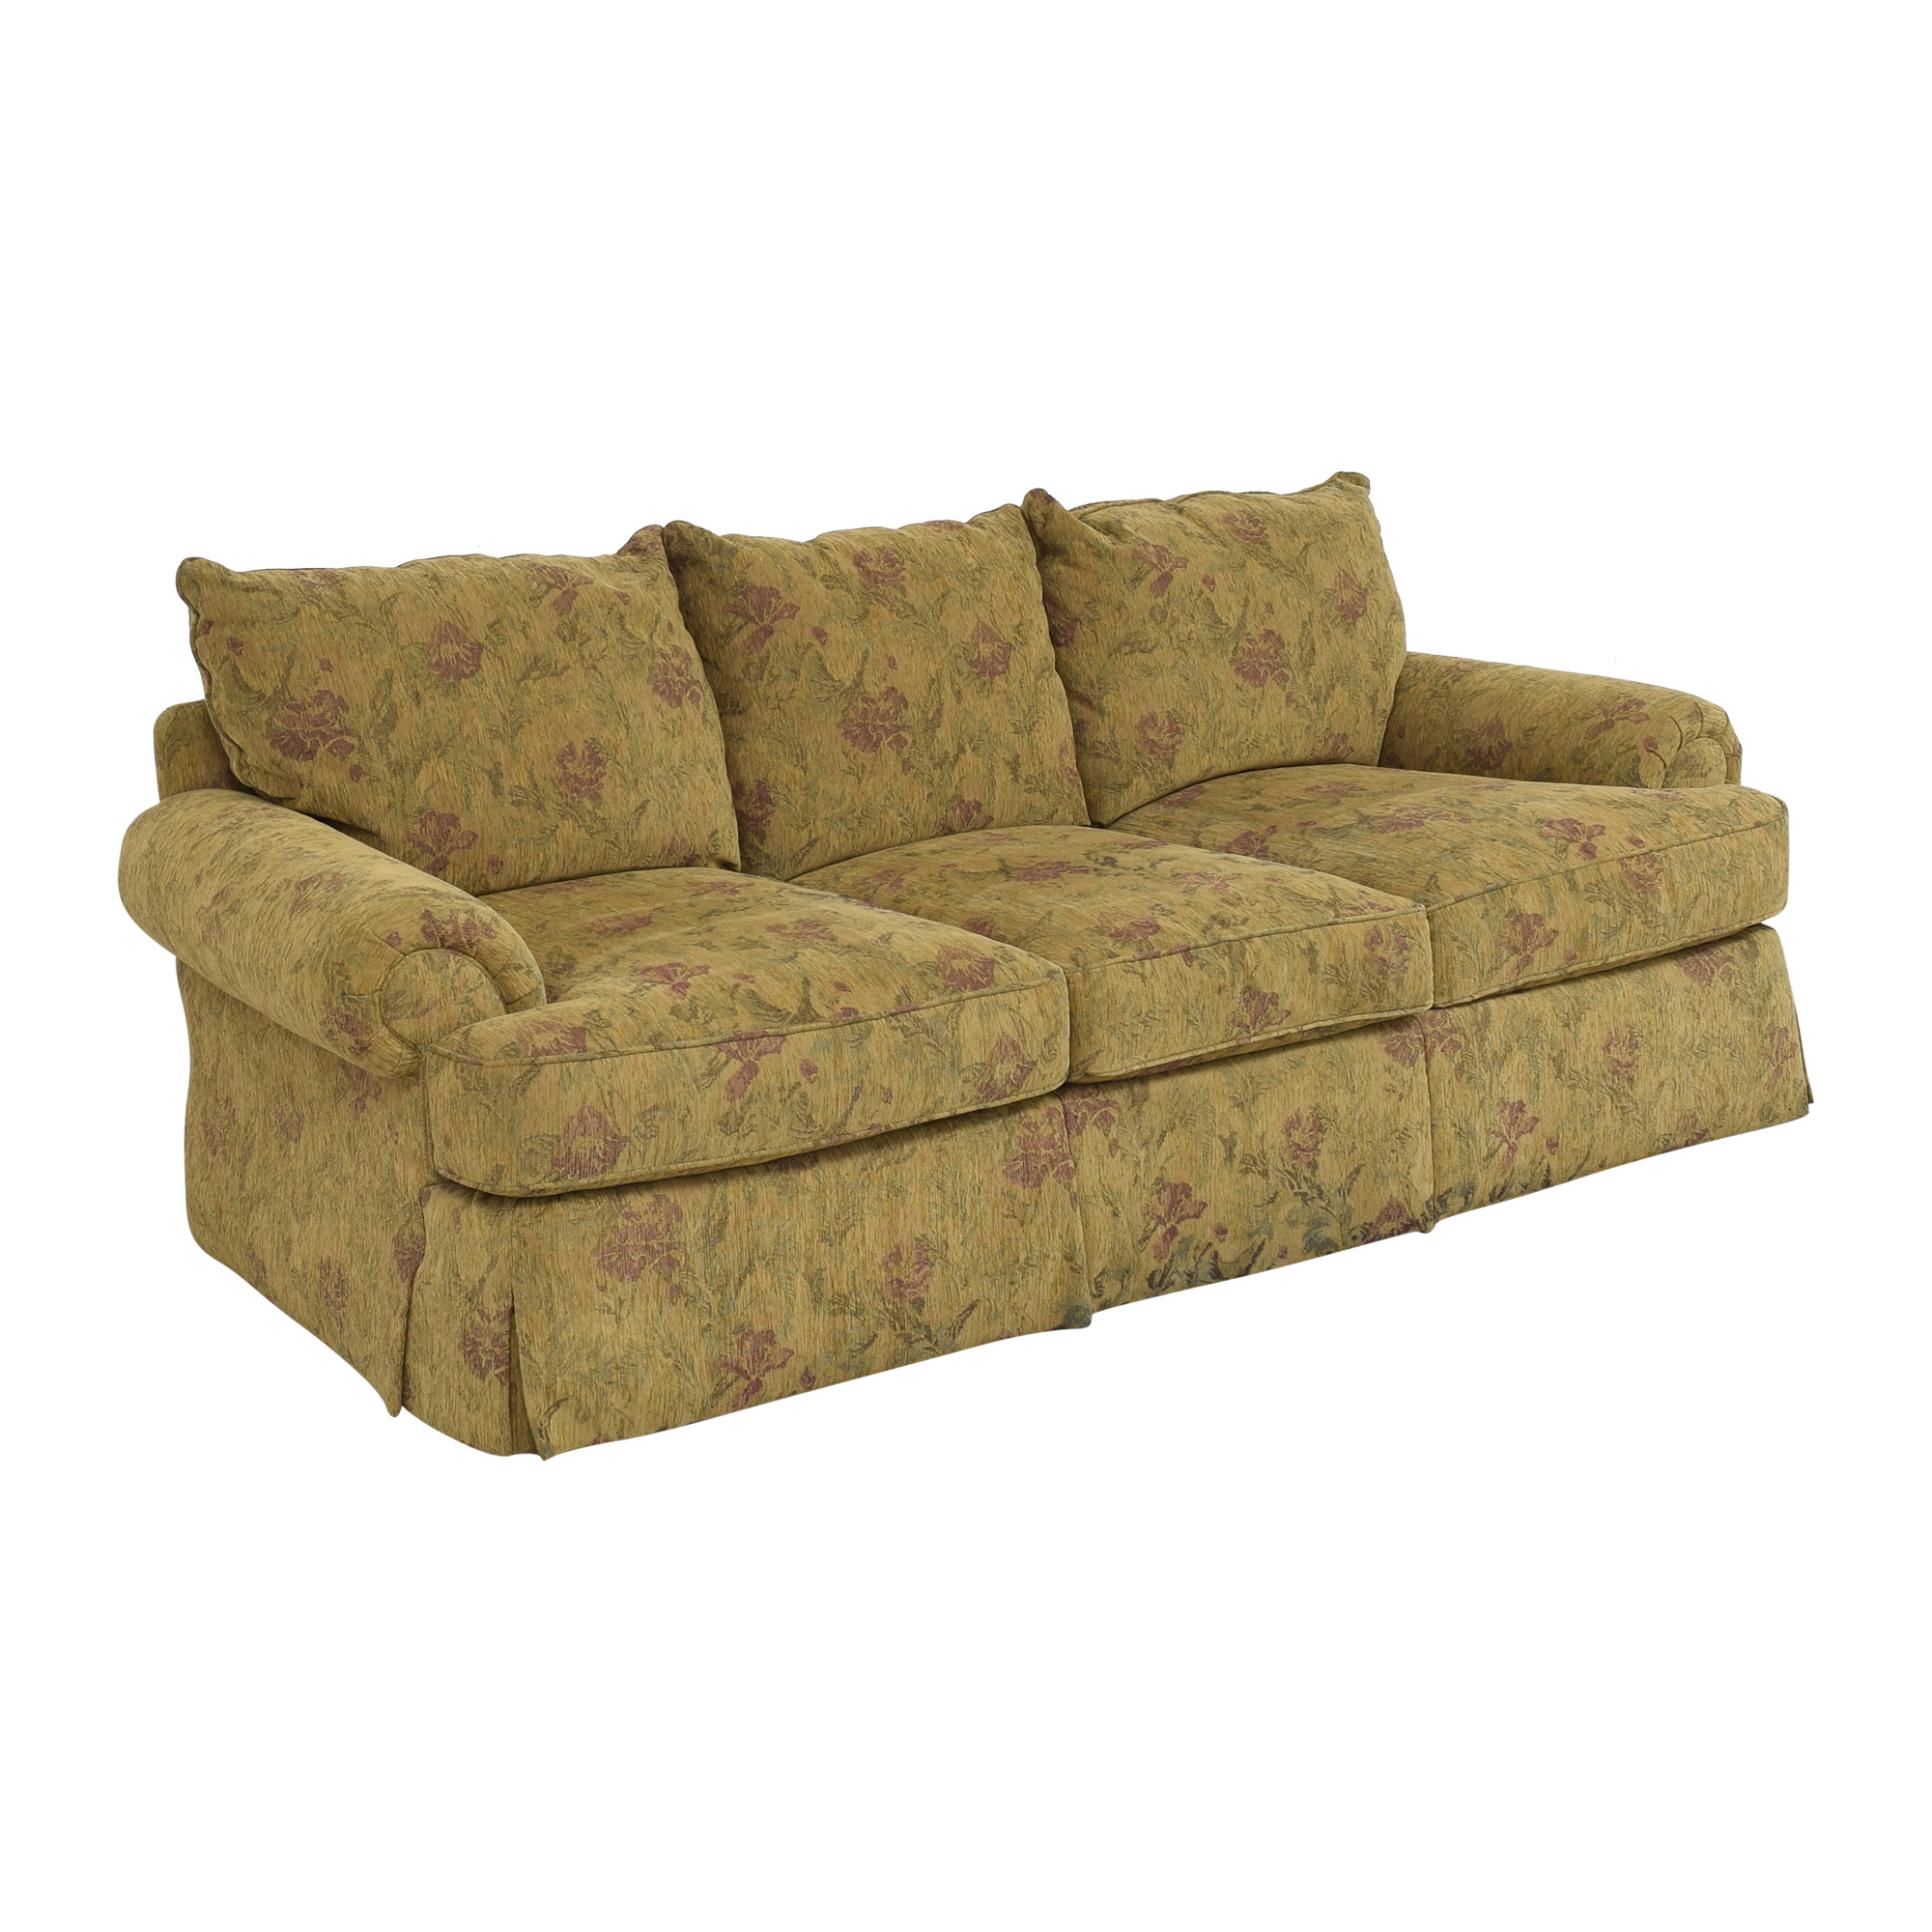 Thomasville Thomasville Floral Three Cushion Sofa used